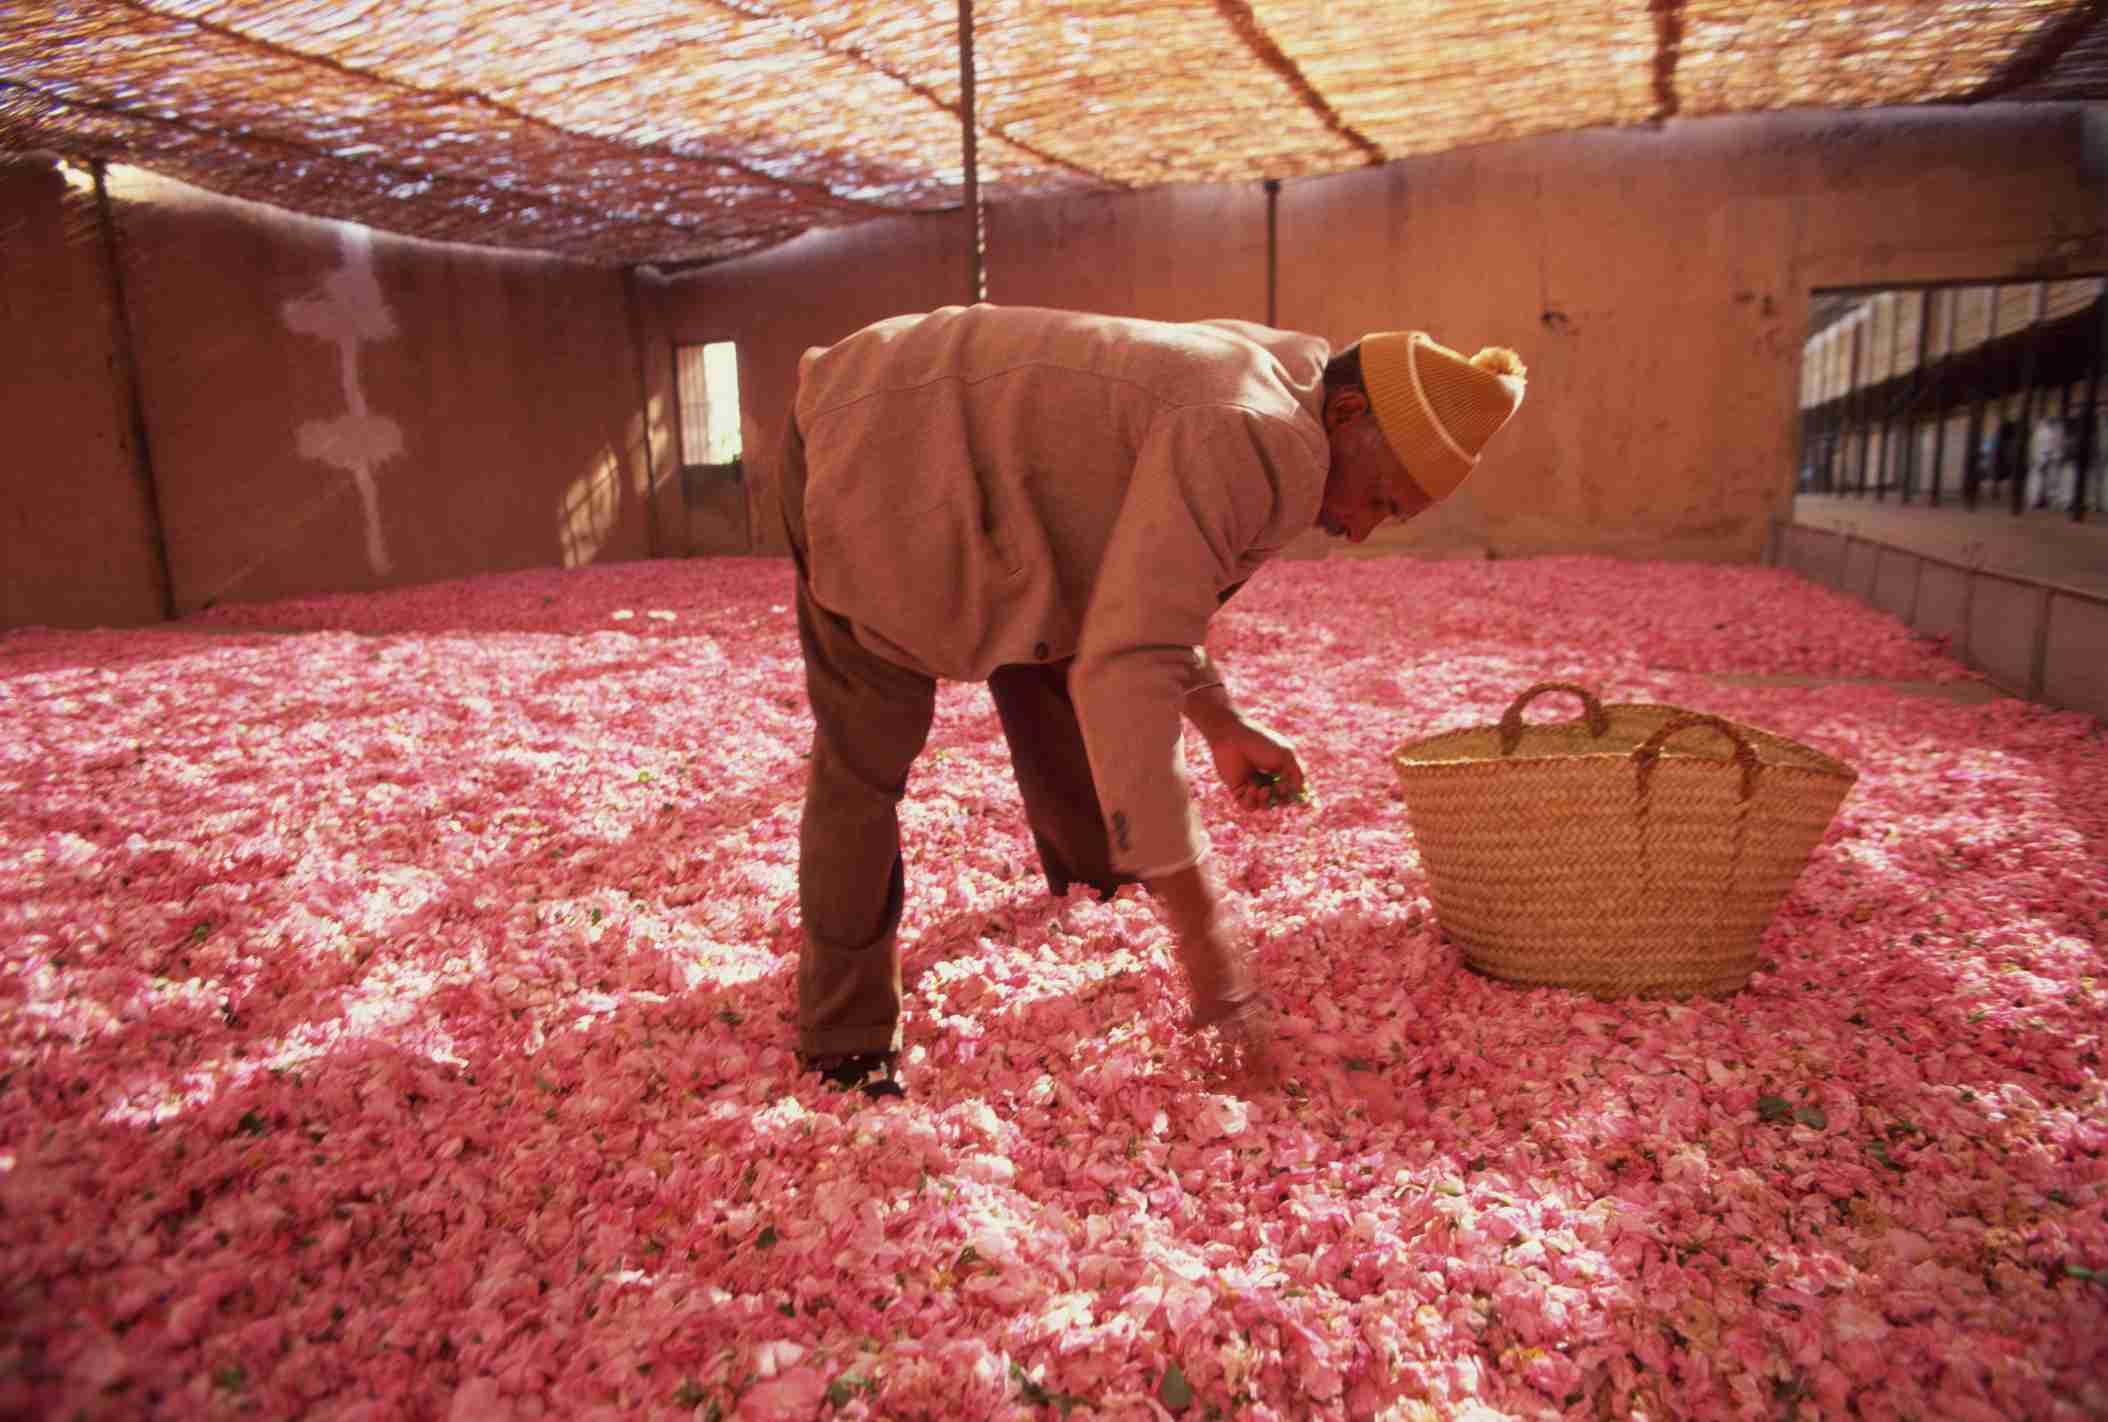 Worker processing rose petals in Kalaat Mgouna, Morocco